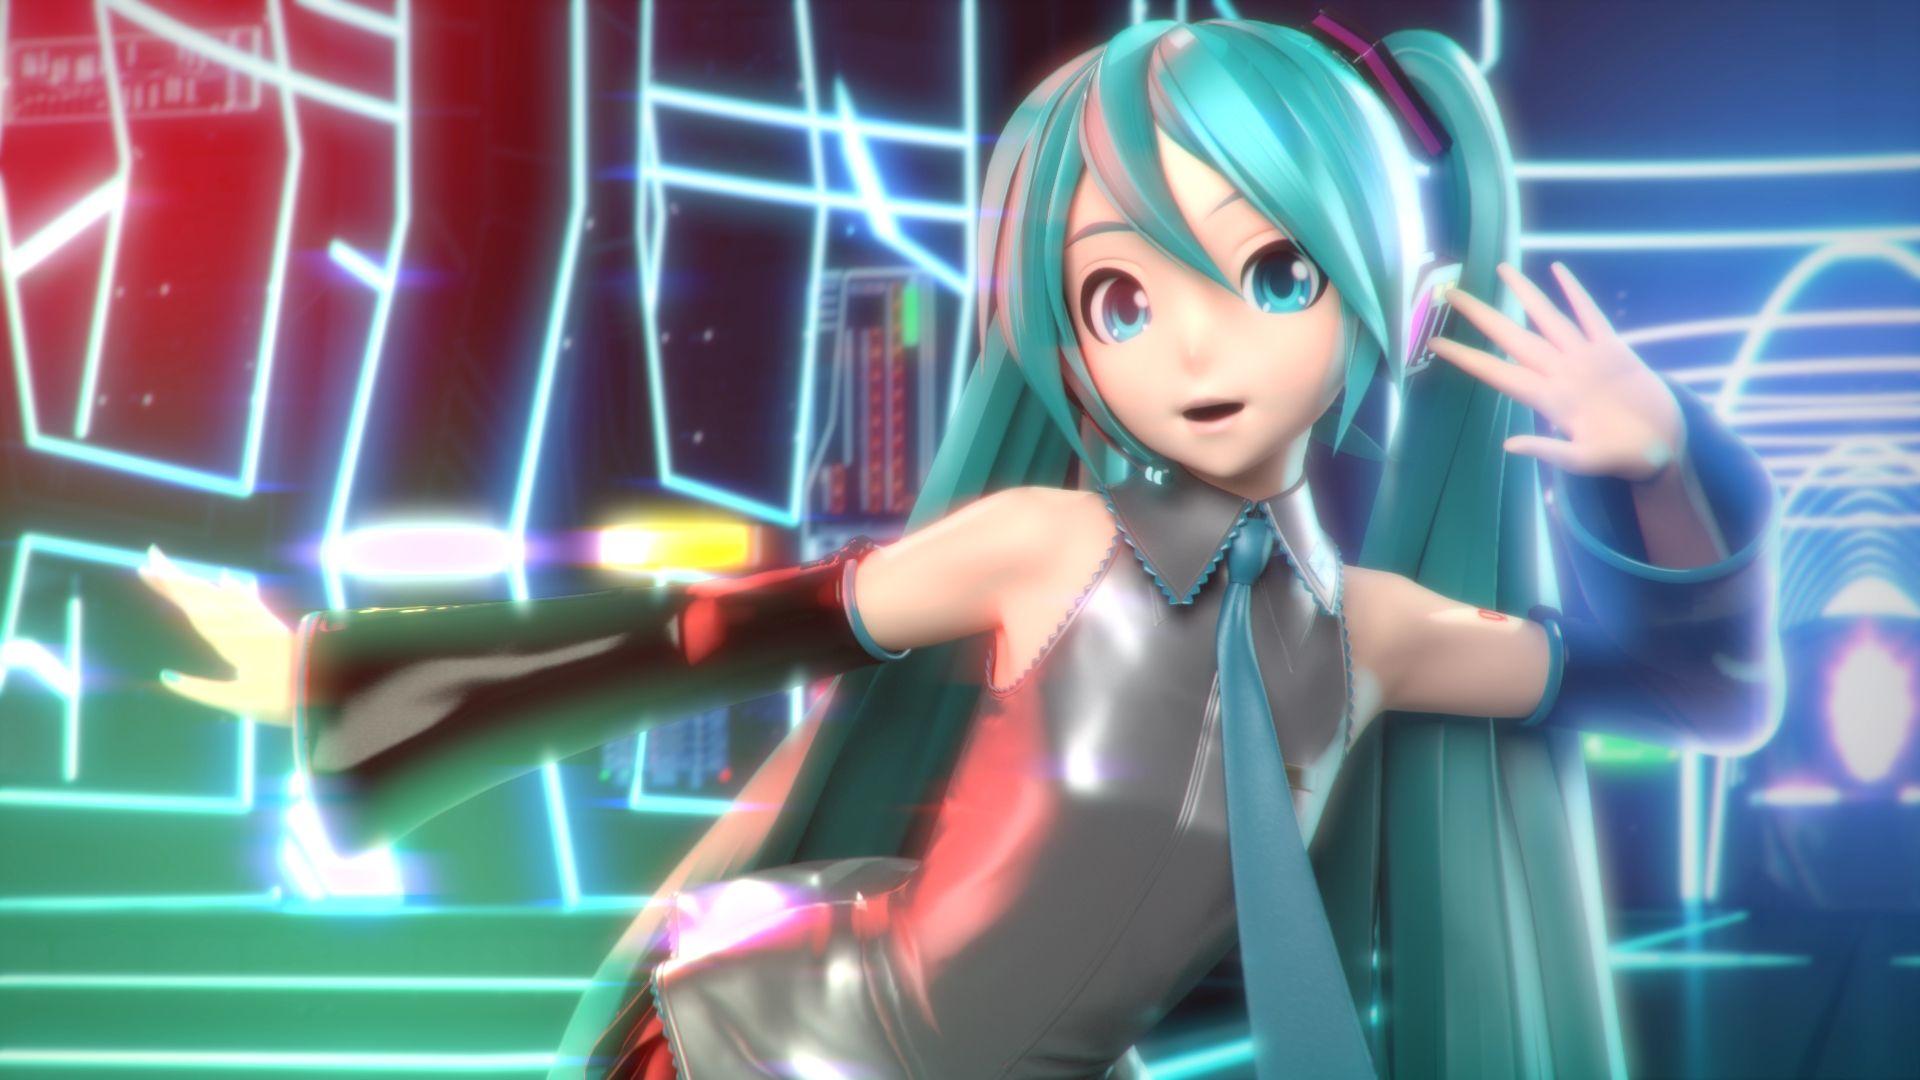 E3 2016 hatsune miku vr future live llegar en octubre for Imagenes movibles anime